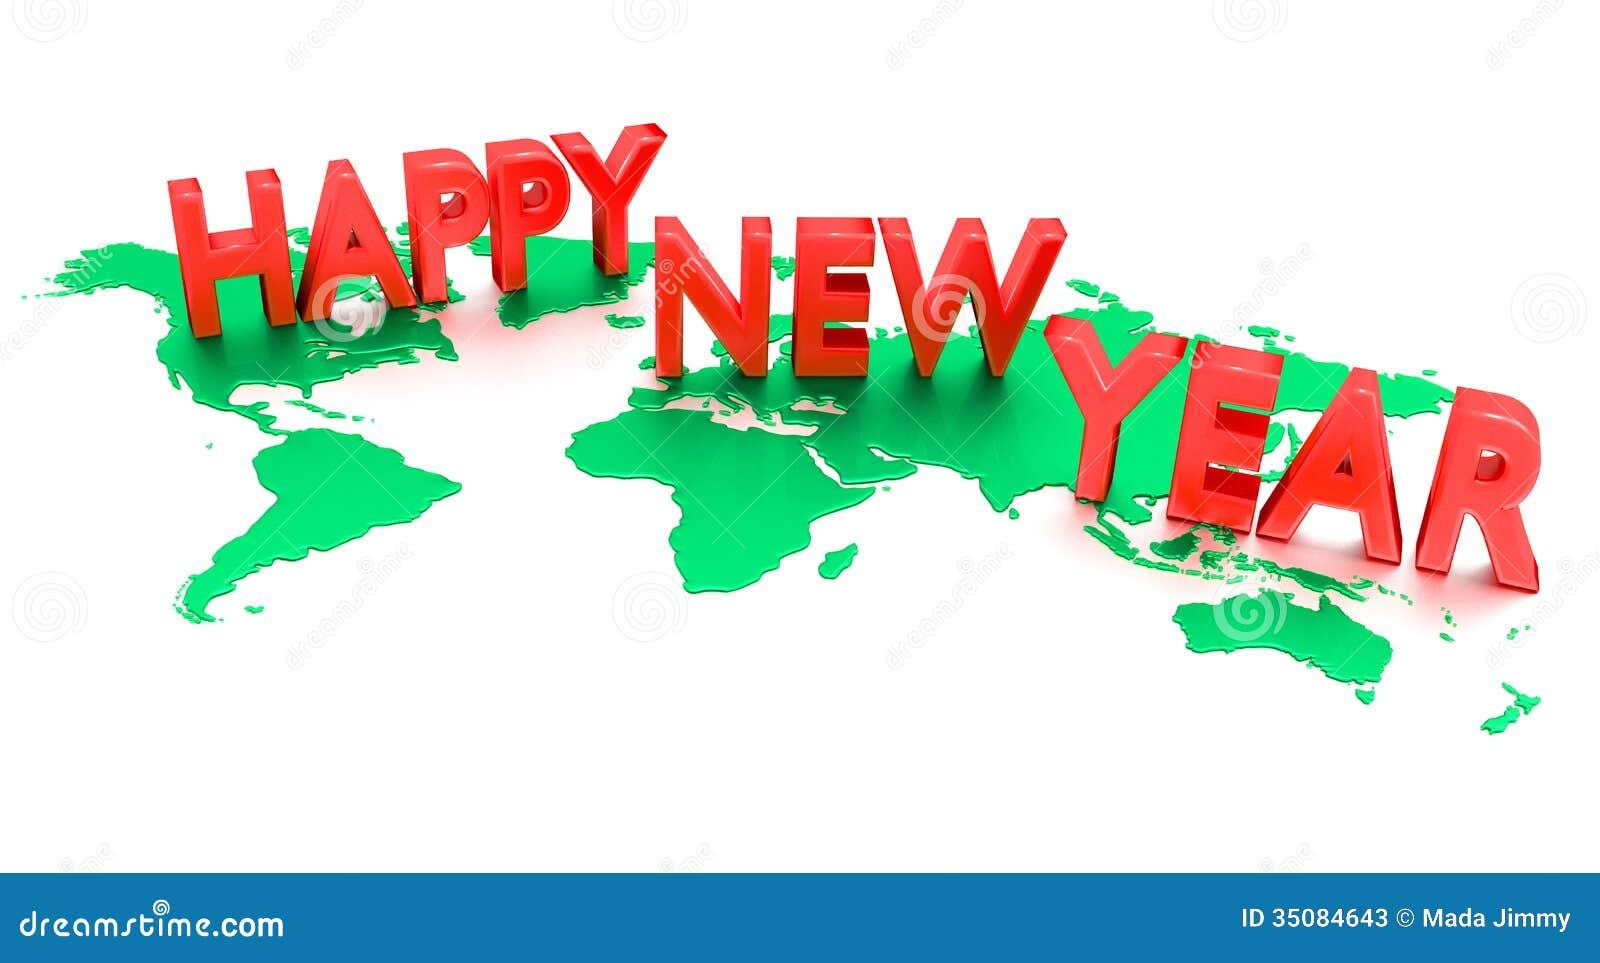 Wallpaper Editorial Calendar : Happy new year stock illustration image of wallpaper